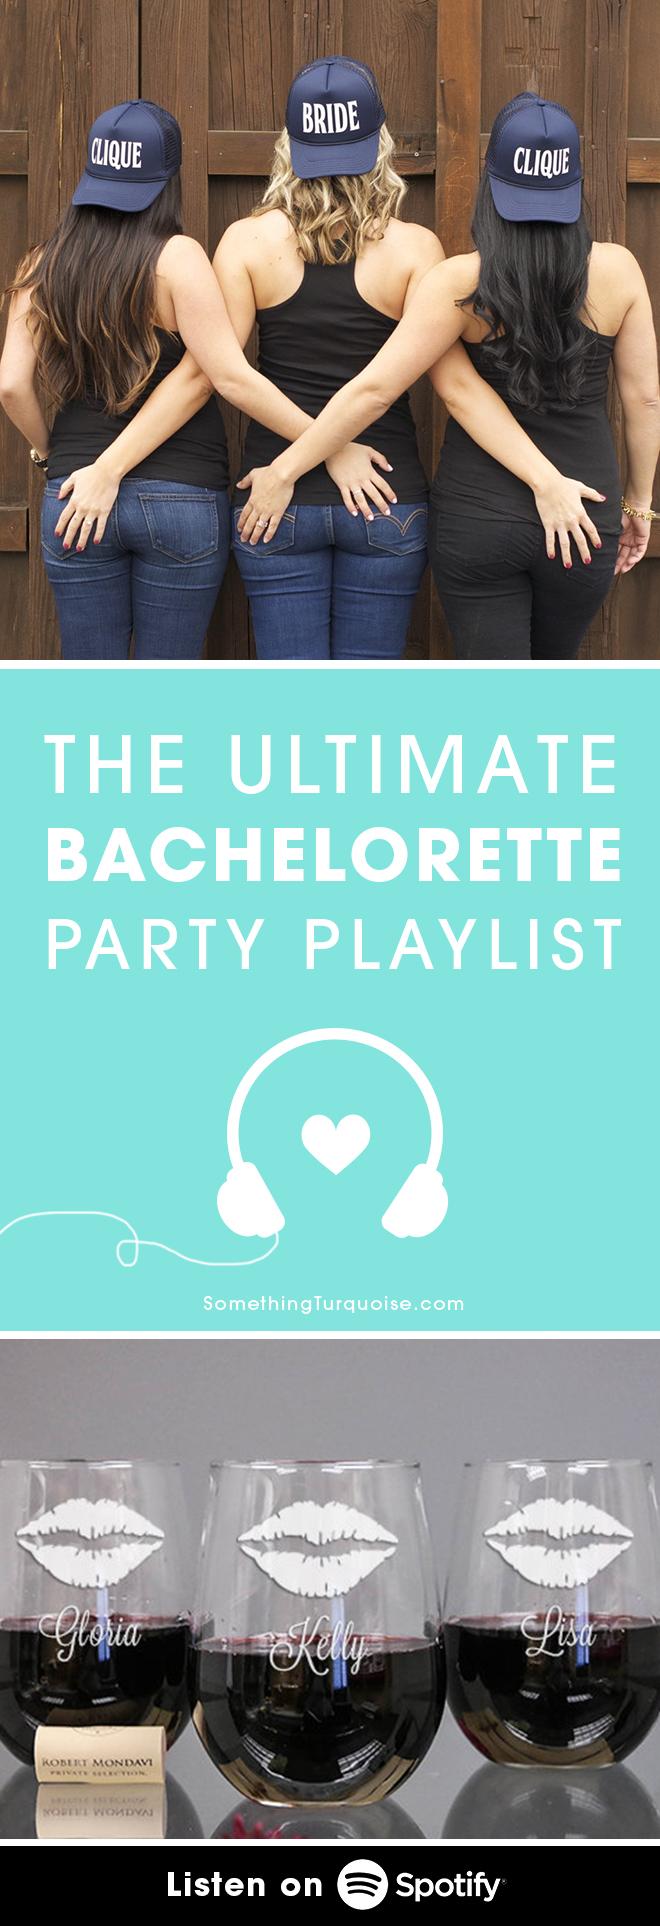 Spotify-Playlist-Bachelorette-Party